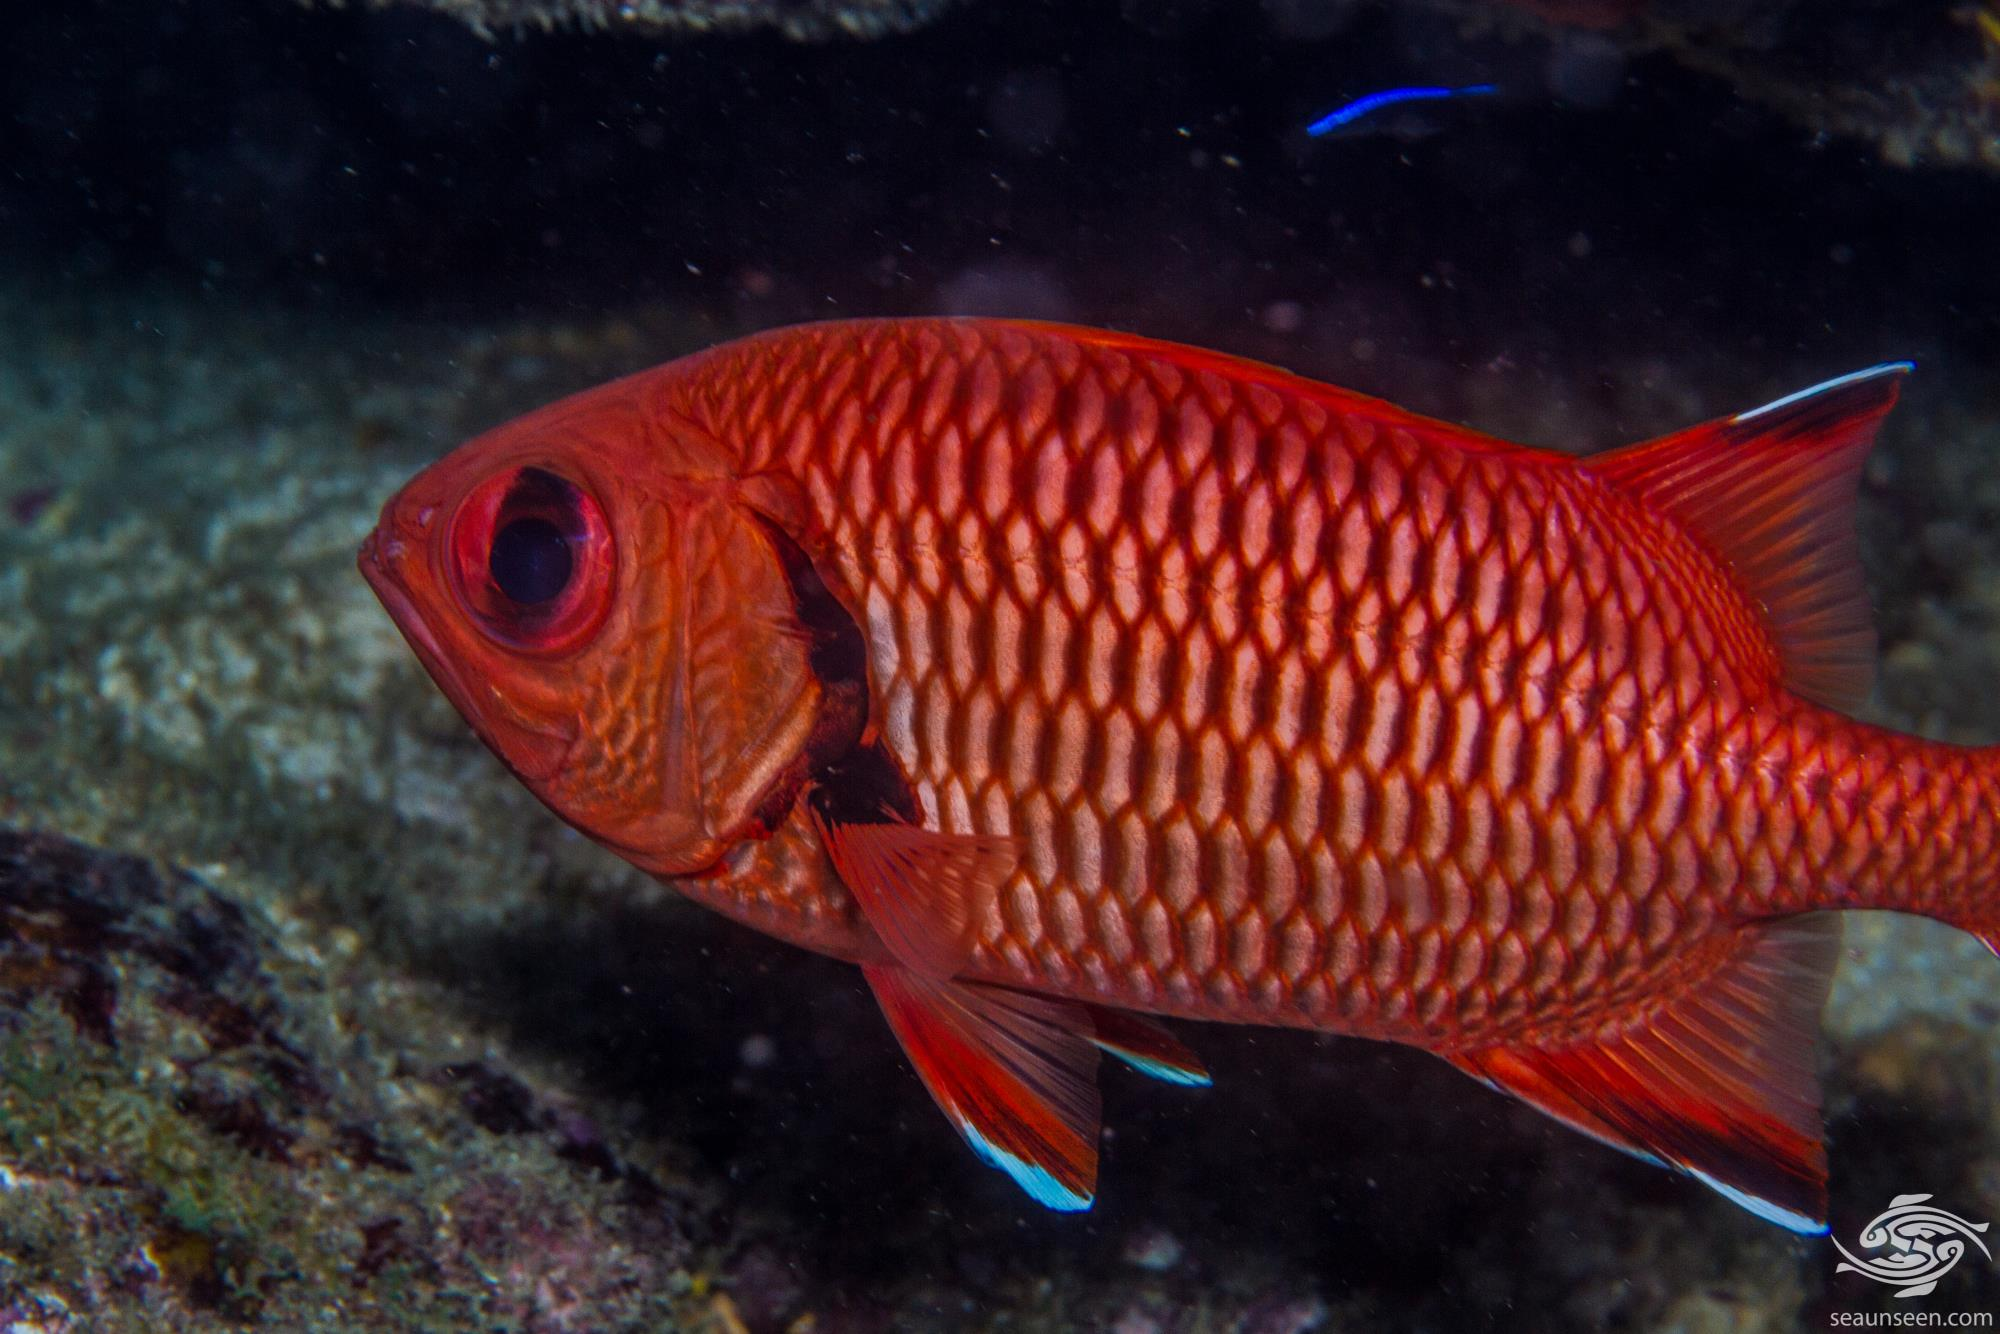 Blotcheye soldierfish Myripristis murjan, is also known as the Red soldierfish, Pinecone soldierfish or Crimson soldierfish